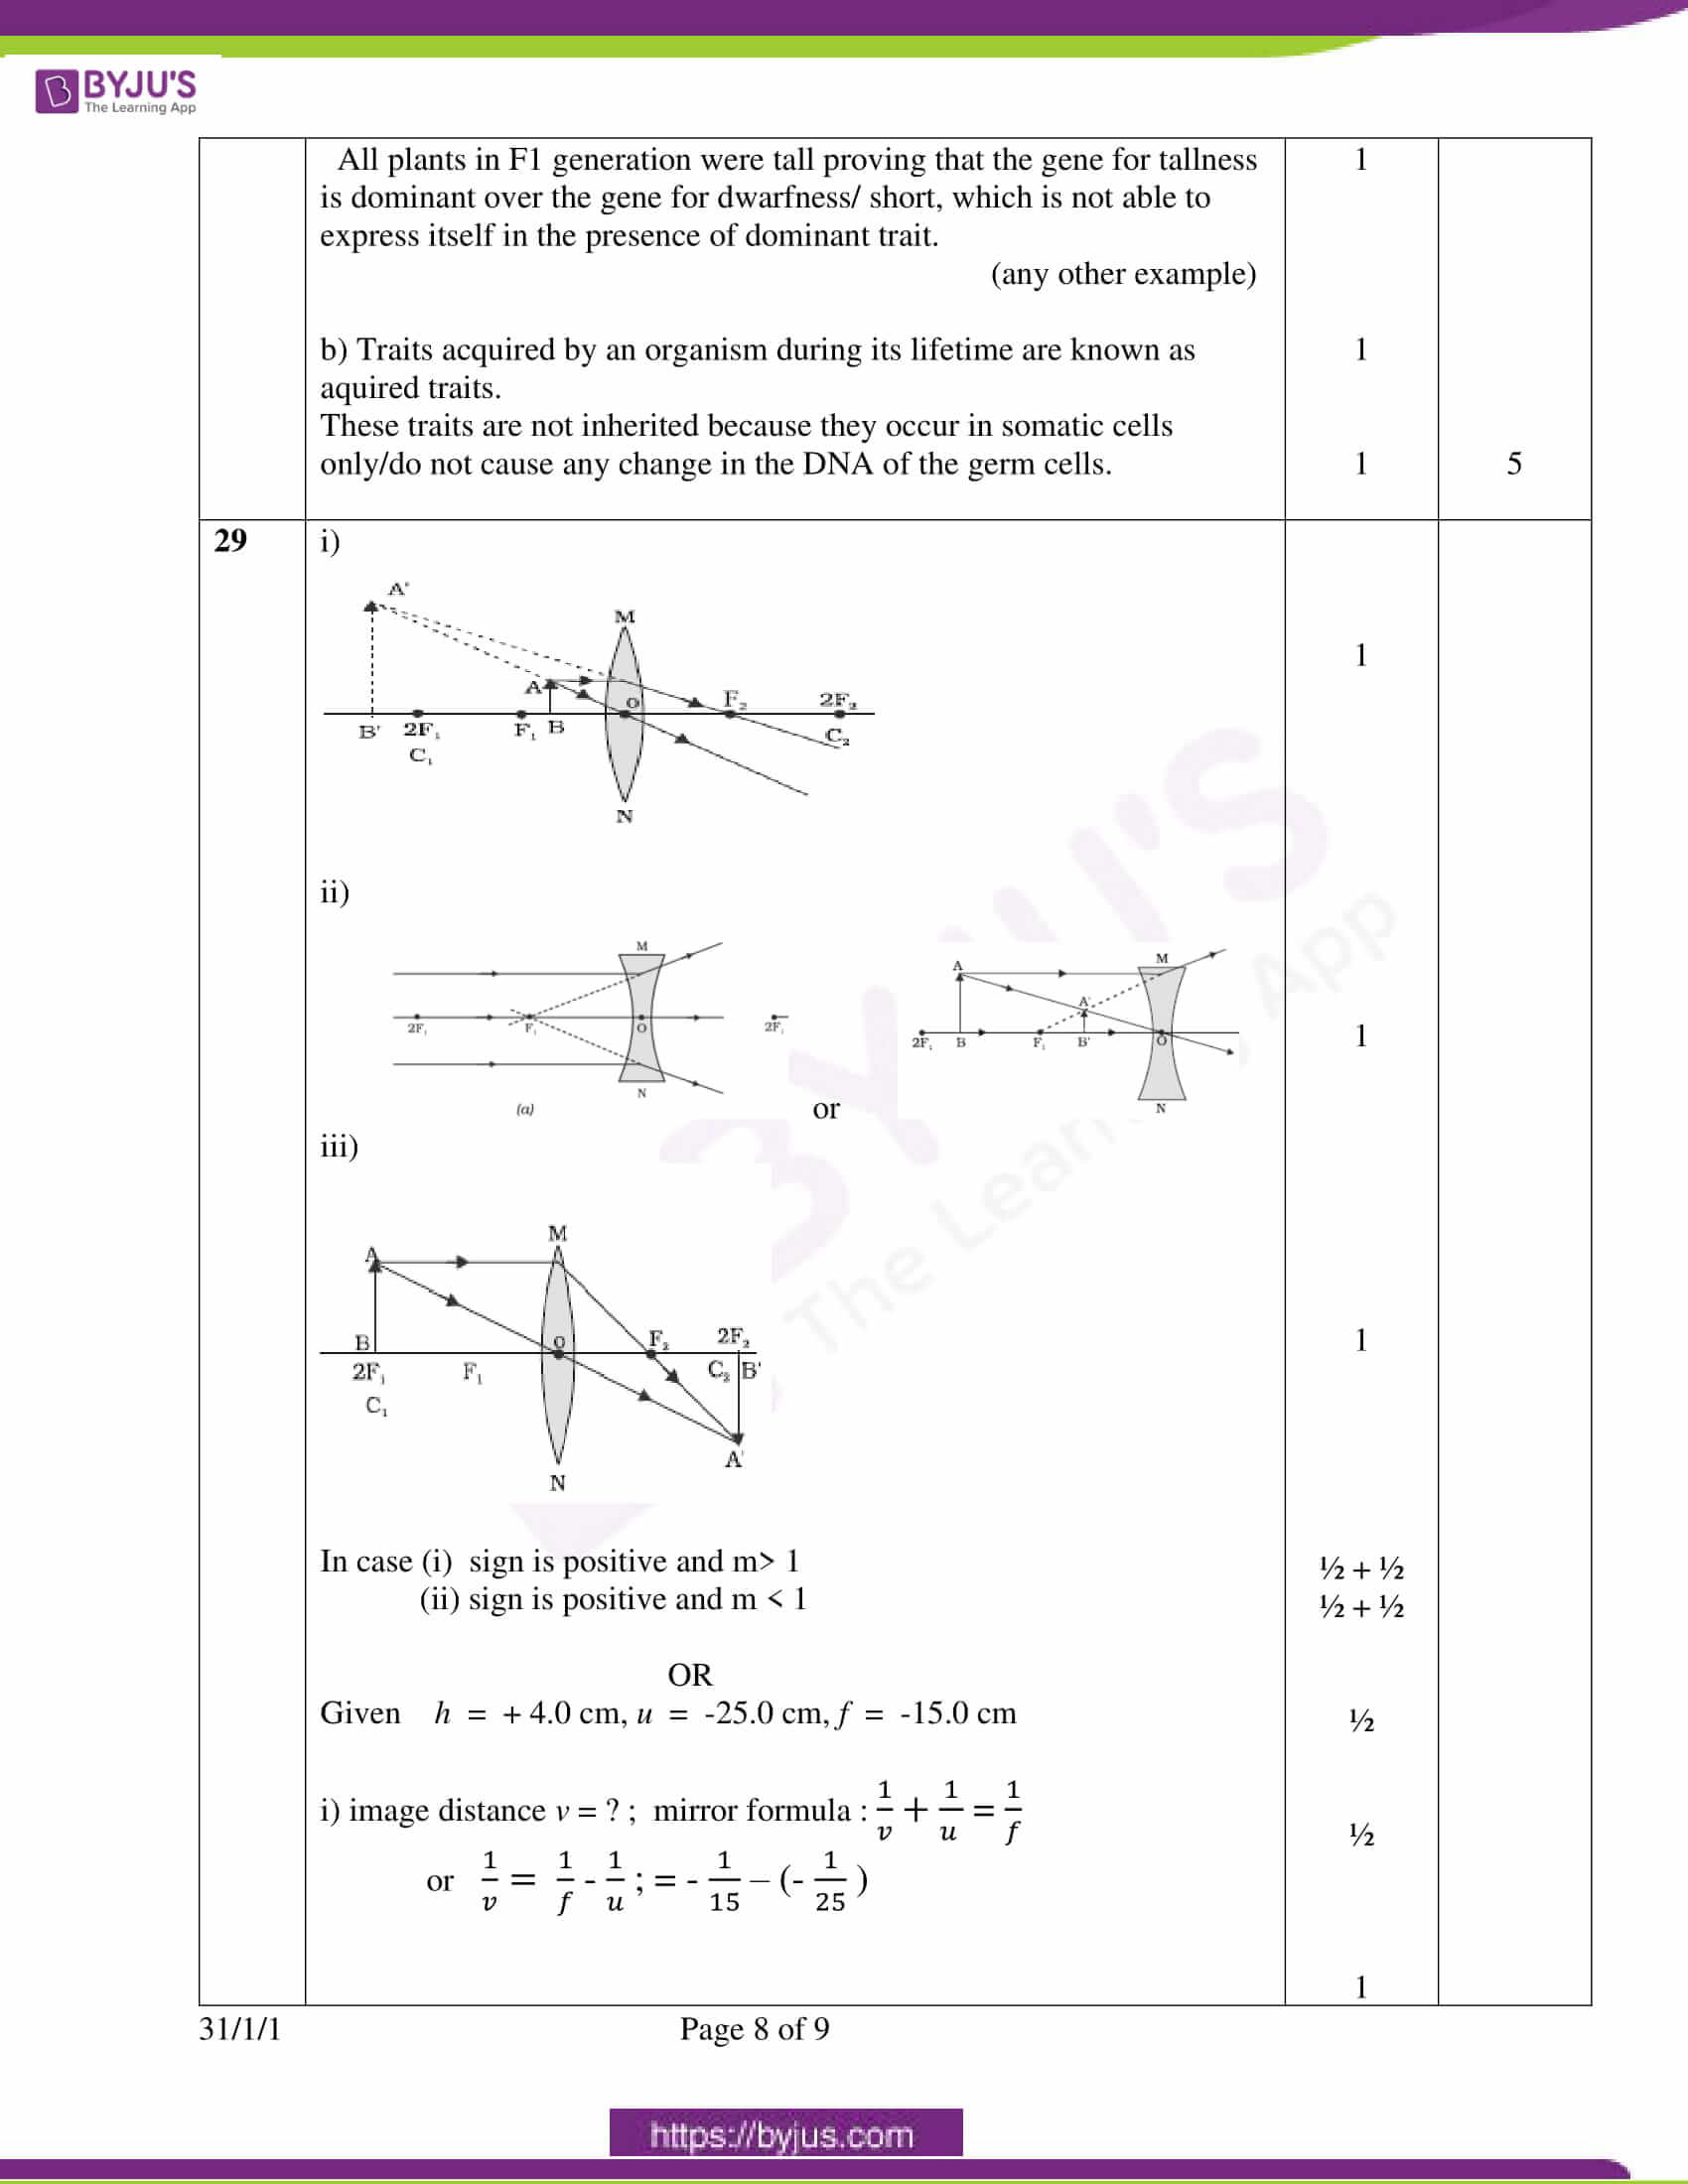 cbse class 10 science question paper set 3 solution 2020 6